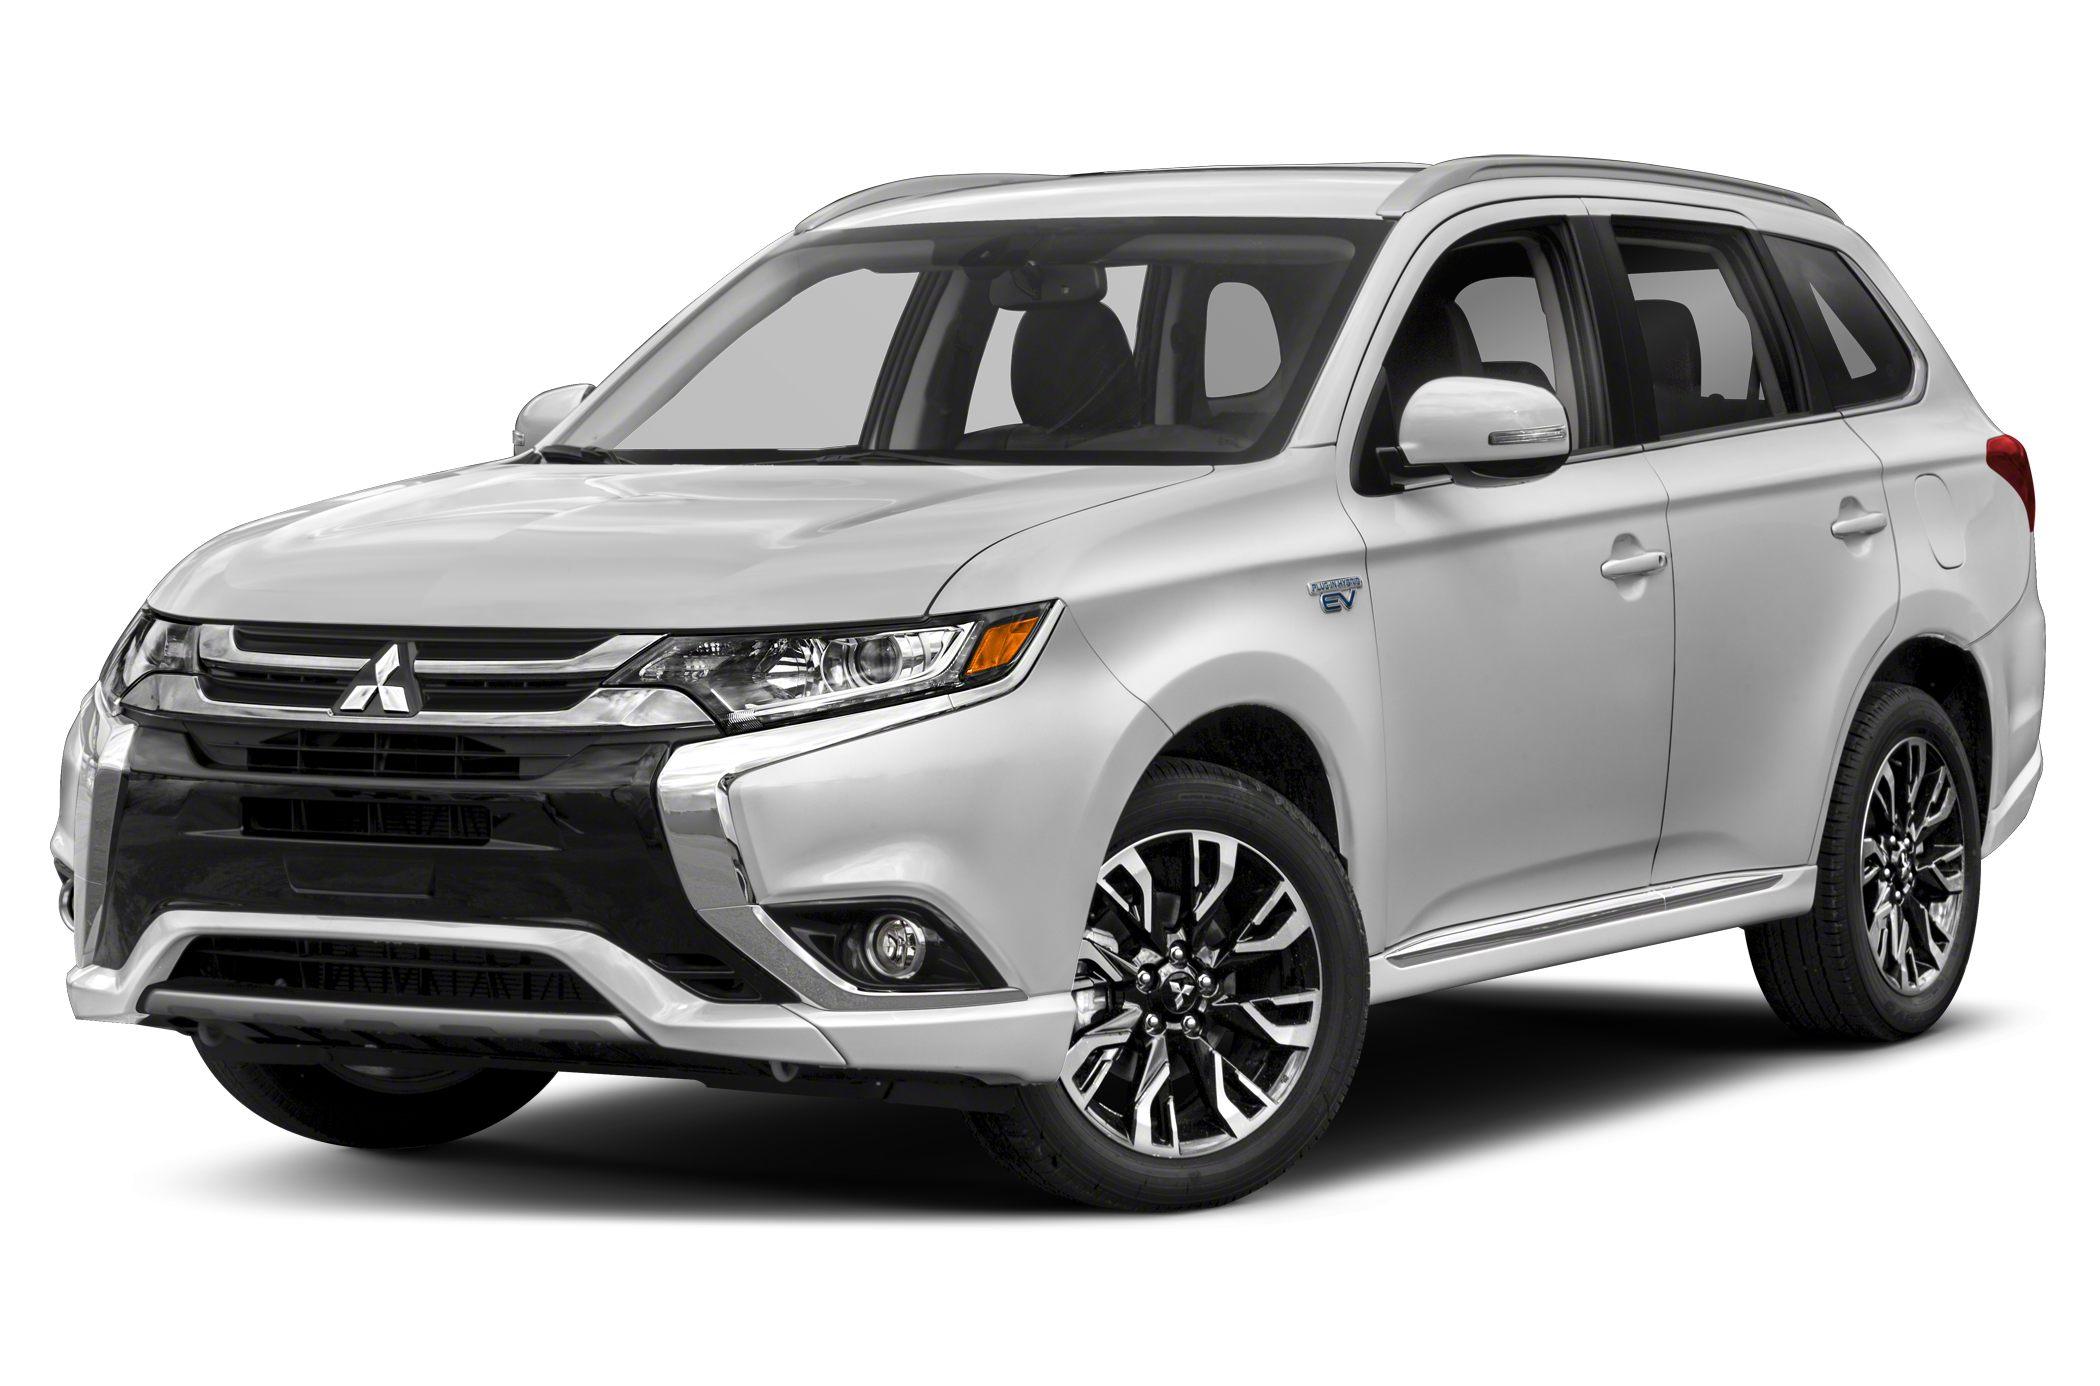 See 2018 Mitsubishi Outlander Color Options Carsdirect